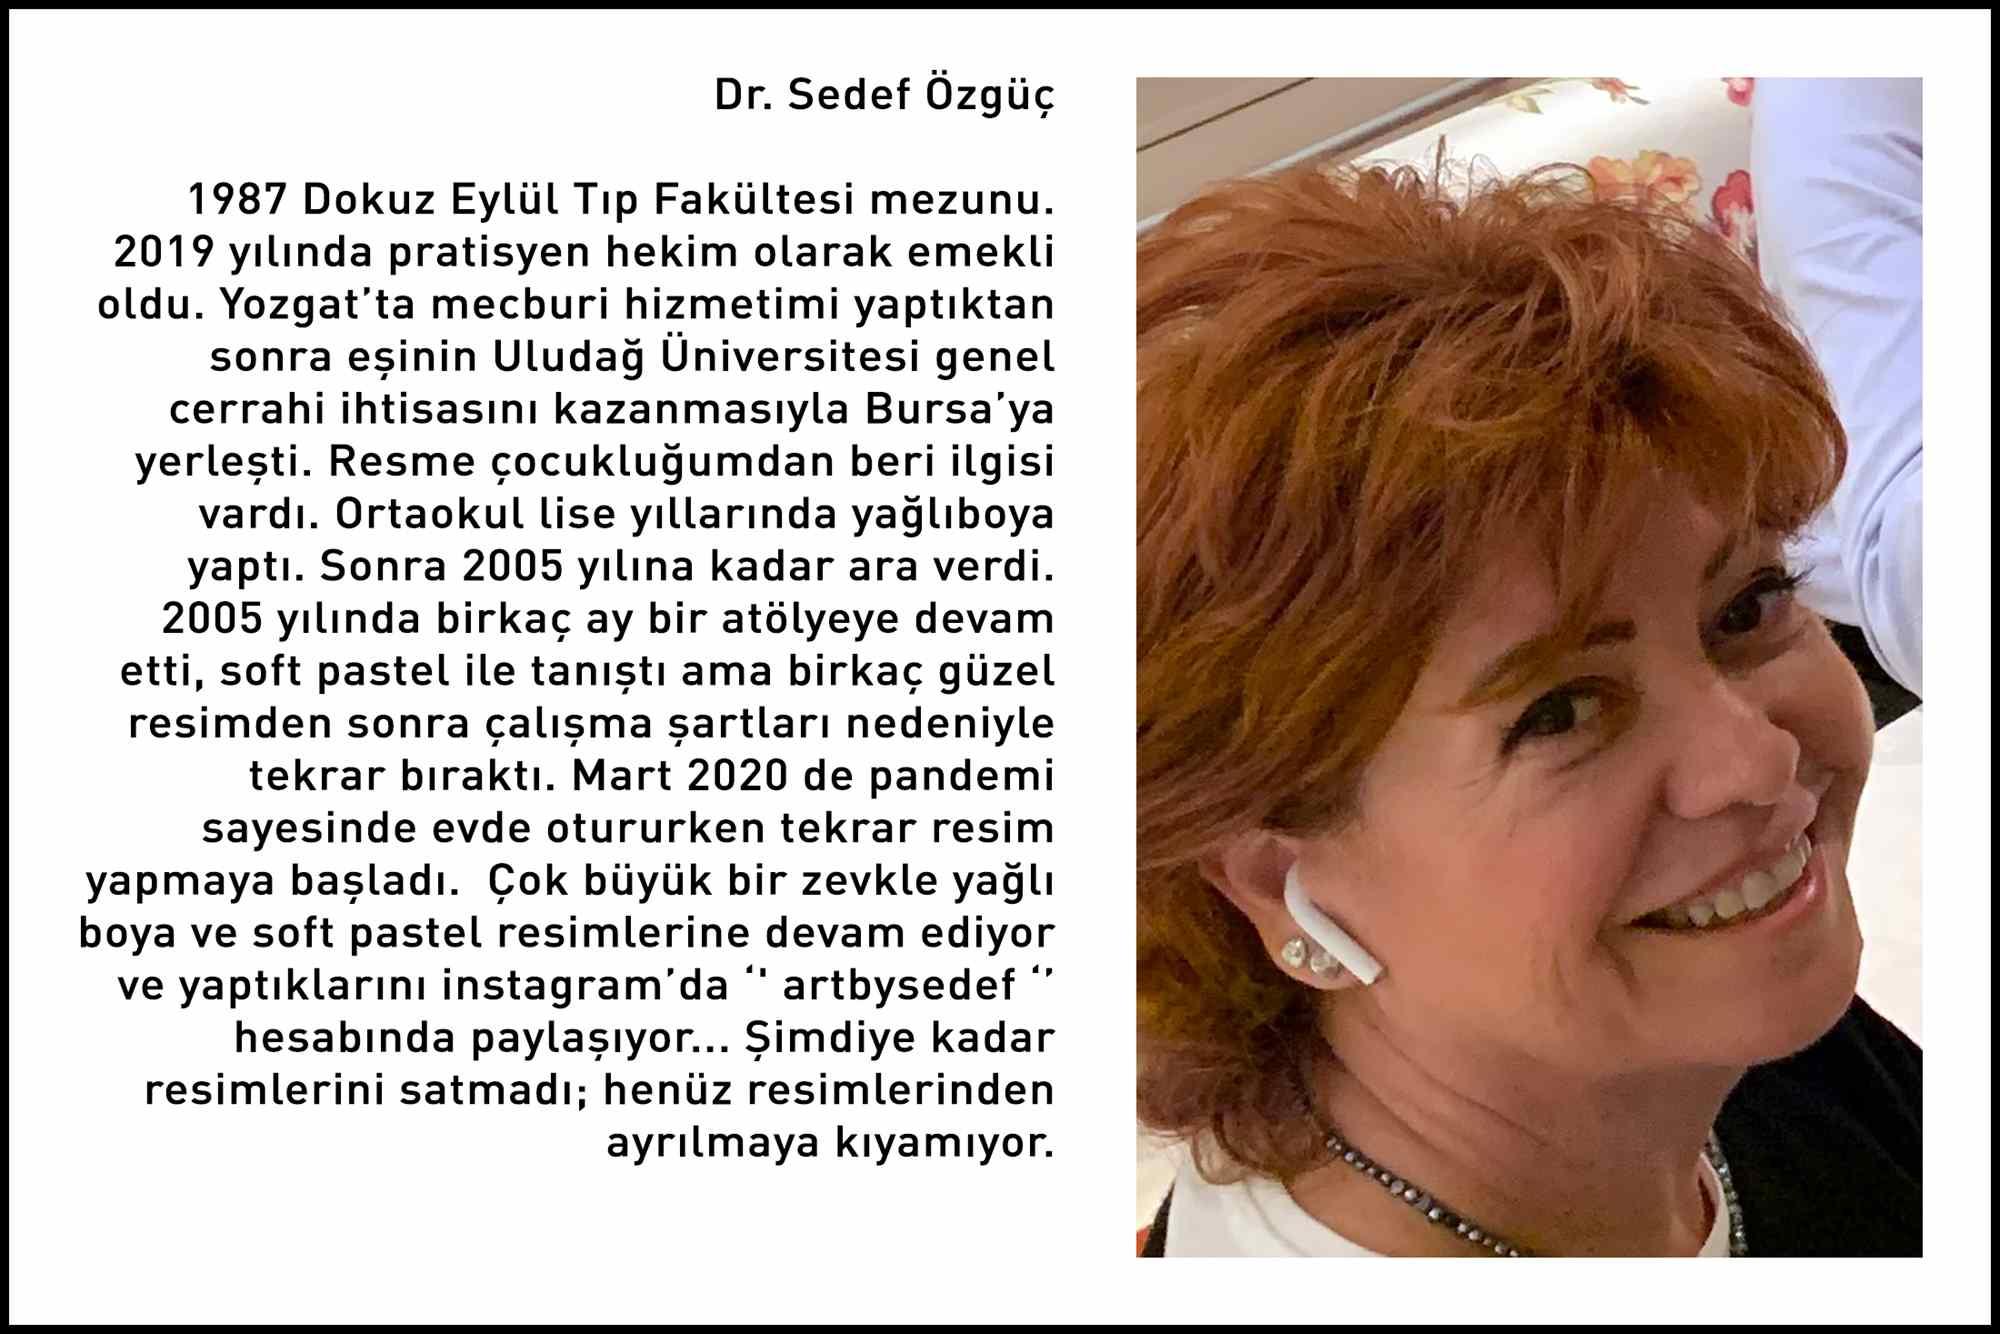 74_sedef-ozguc-ozgecmis